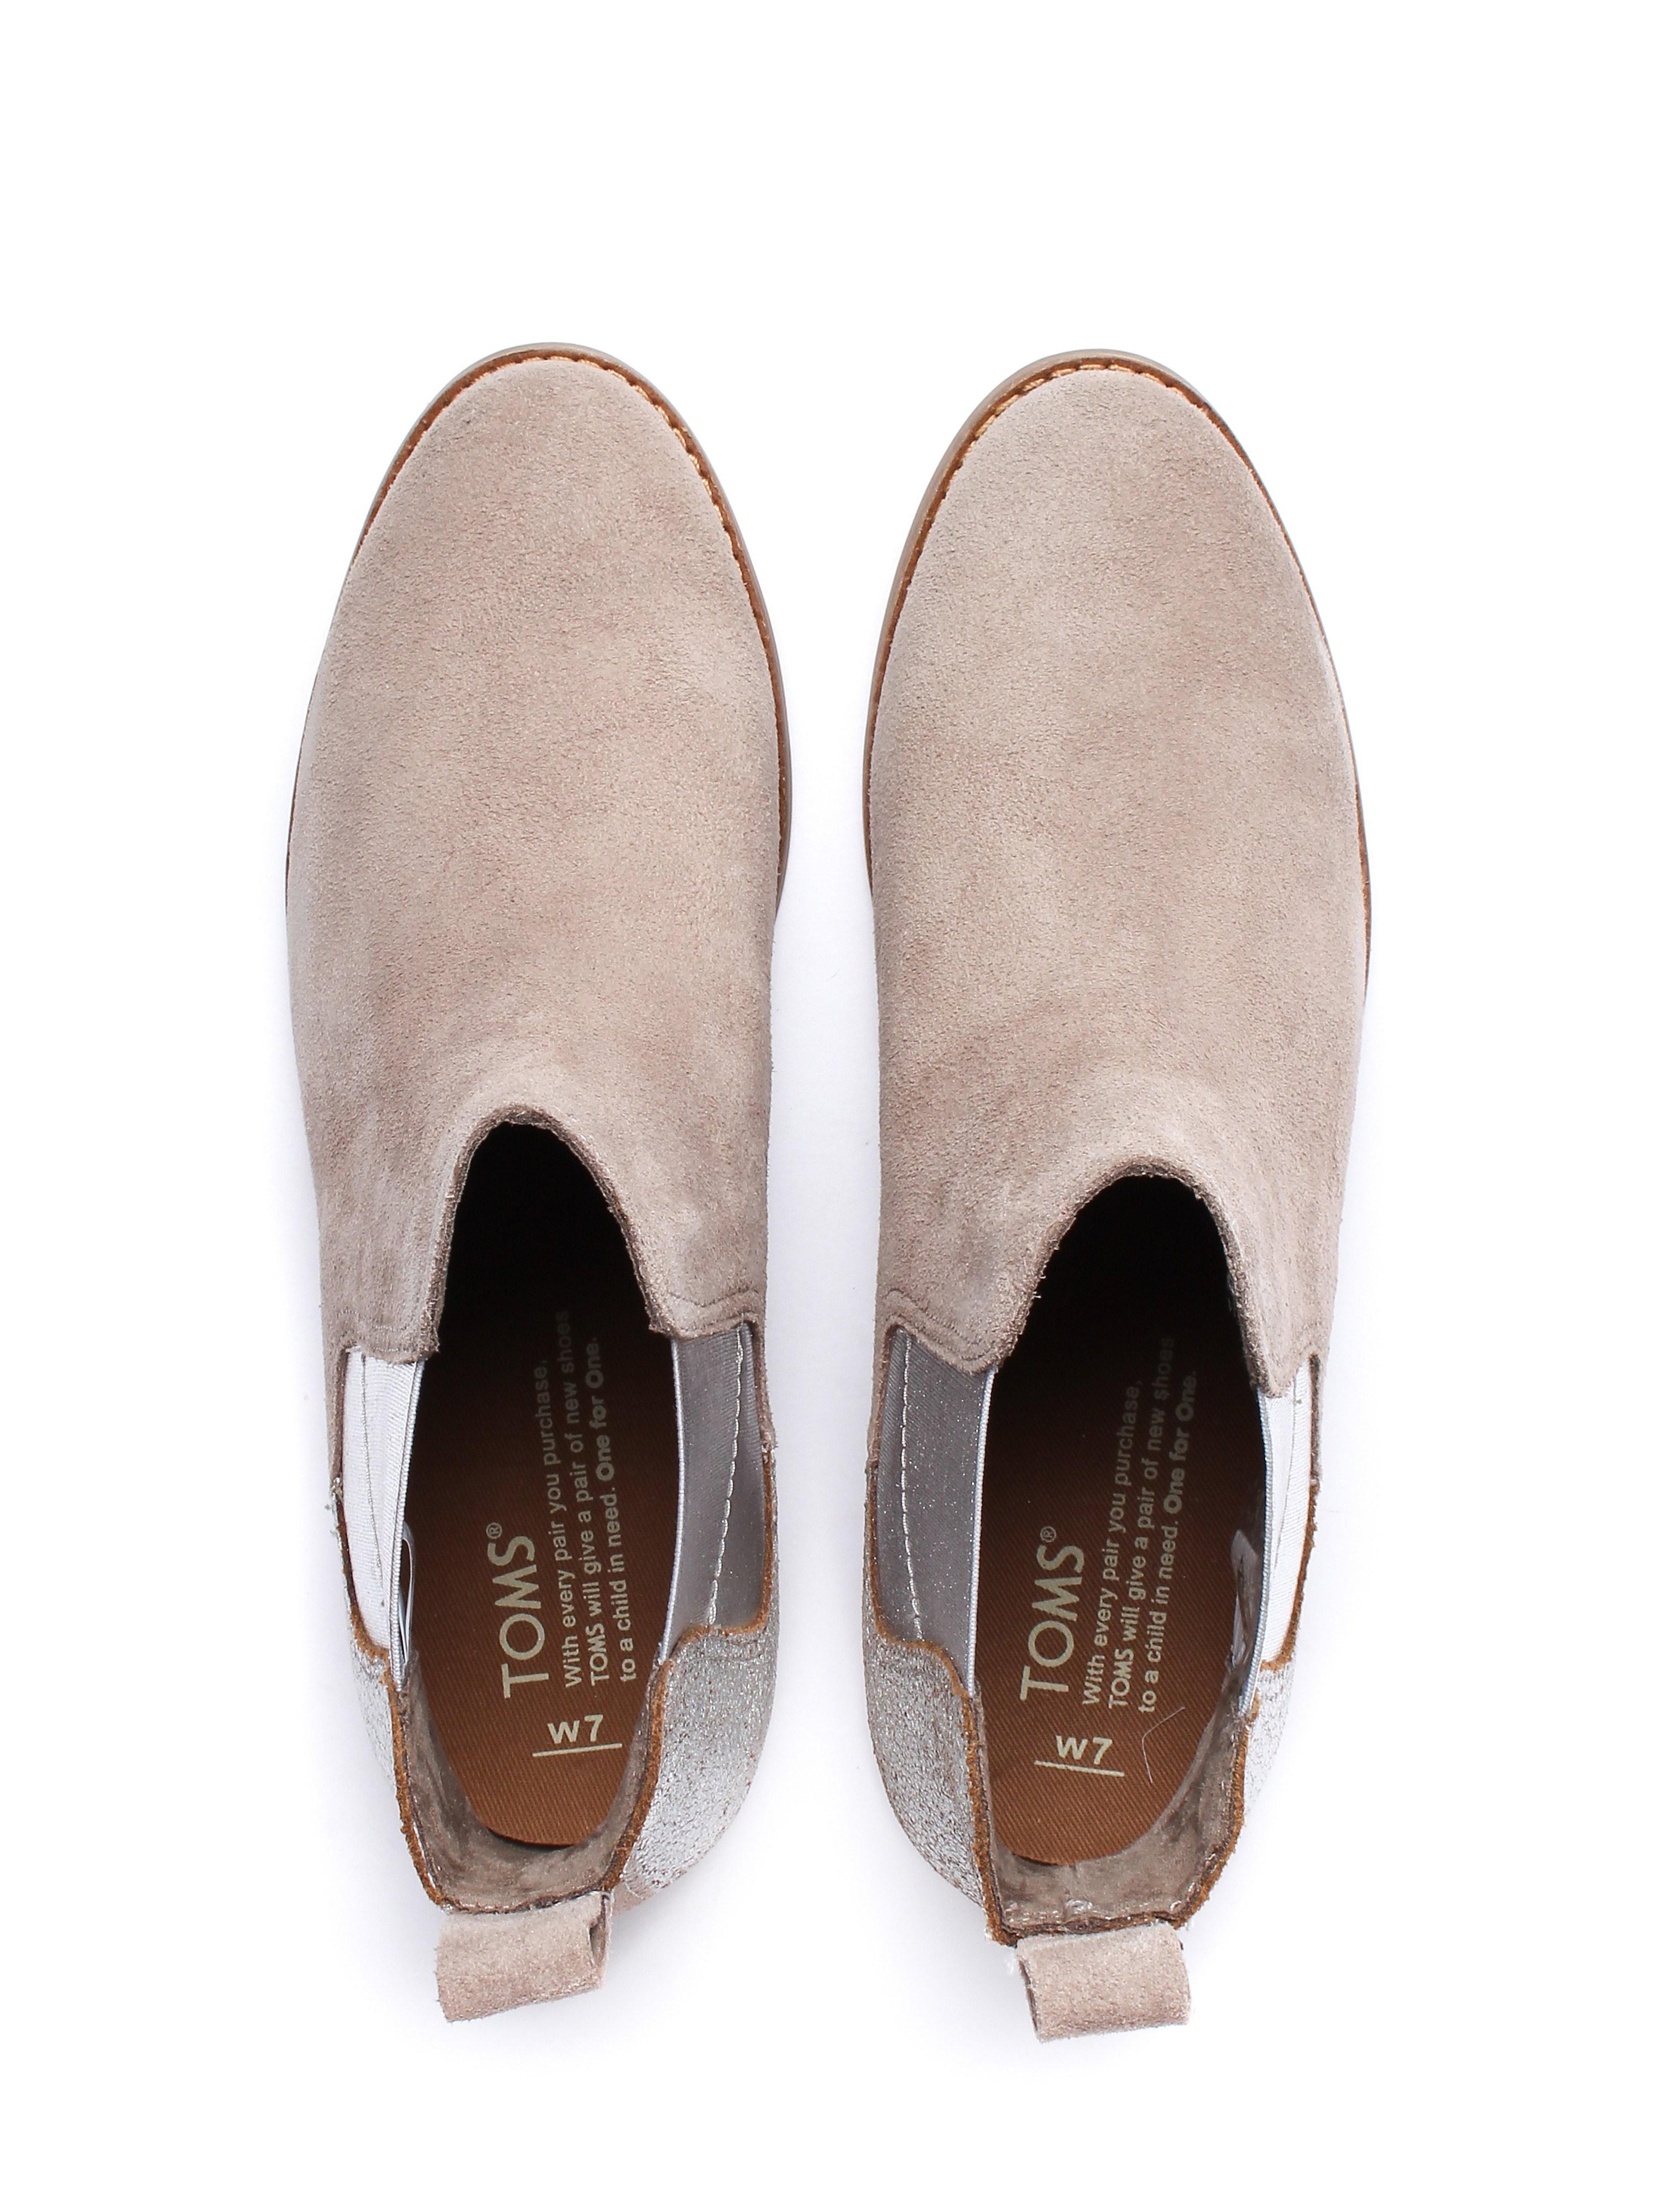 Toms Women's Ella Chelsea Boots - Taupe